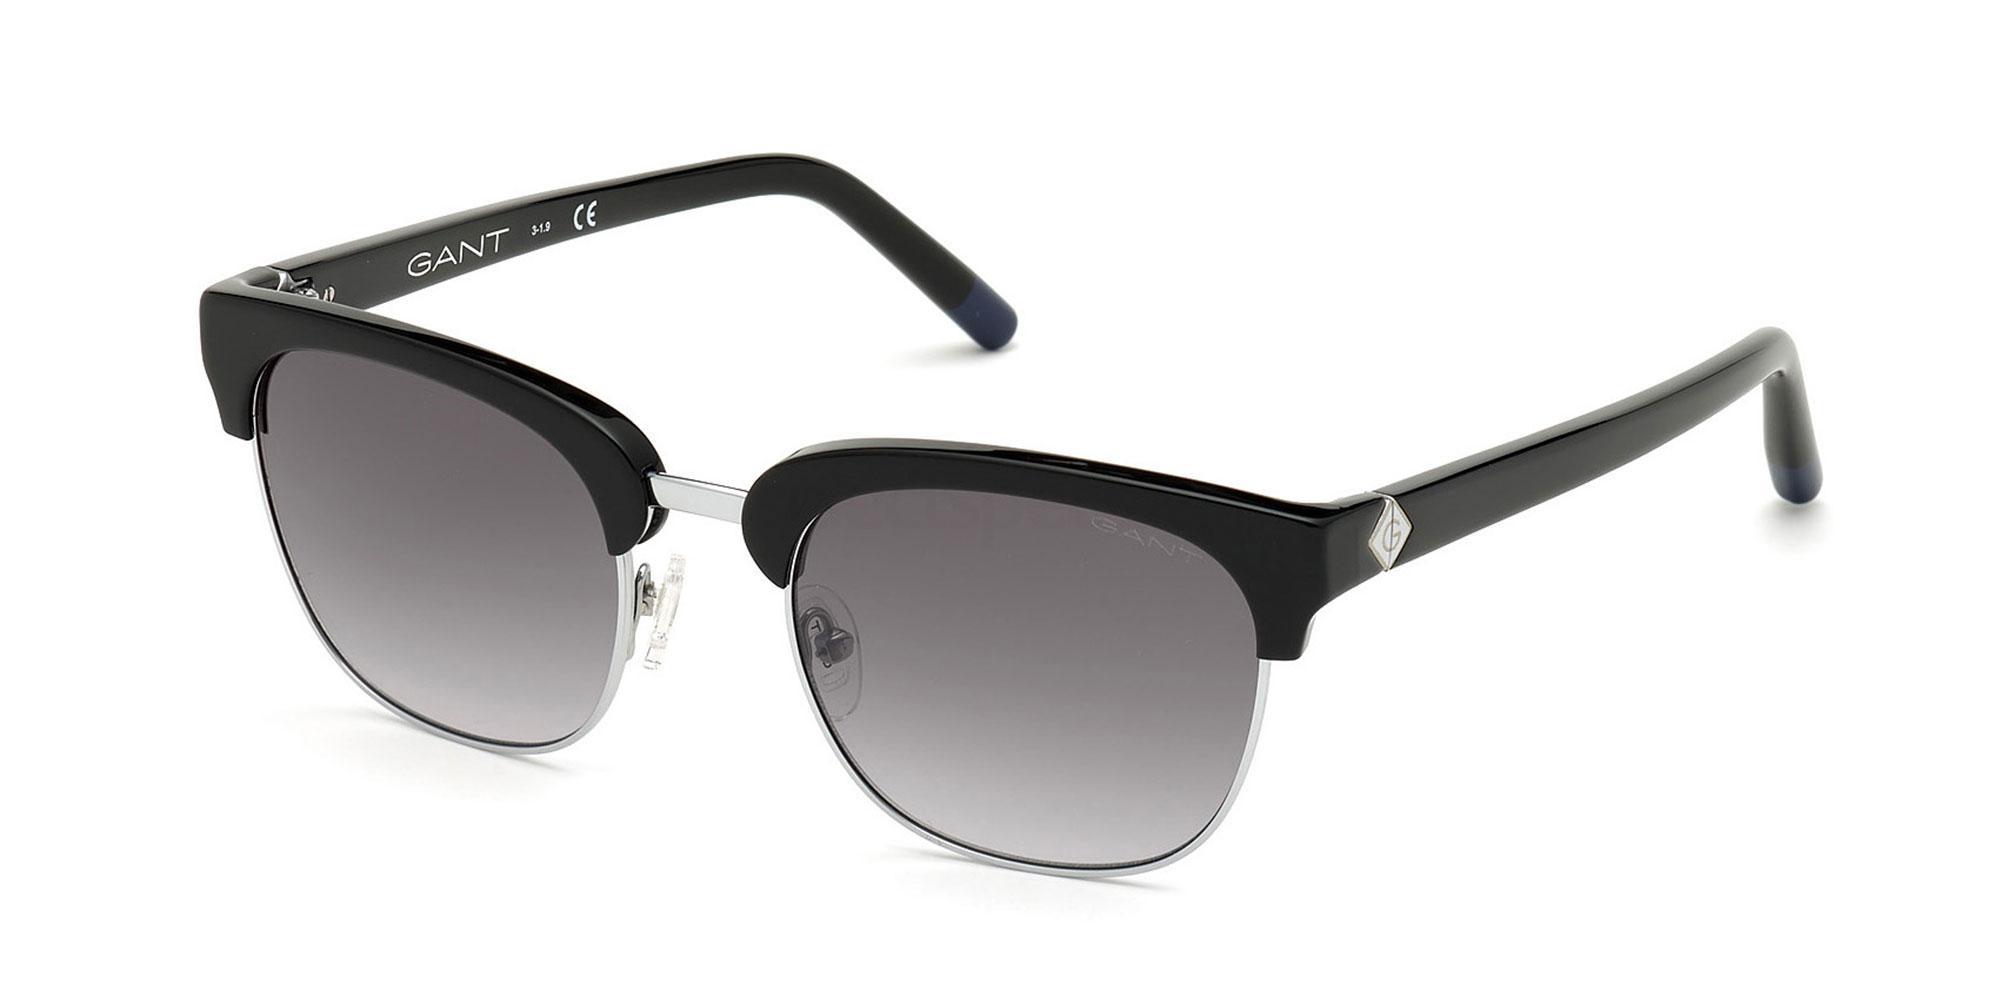 01B GA7121 Sunglasses, Gant